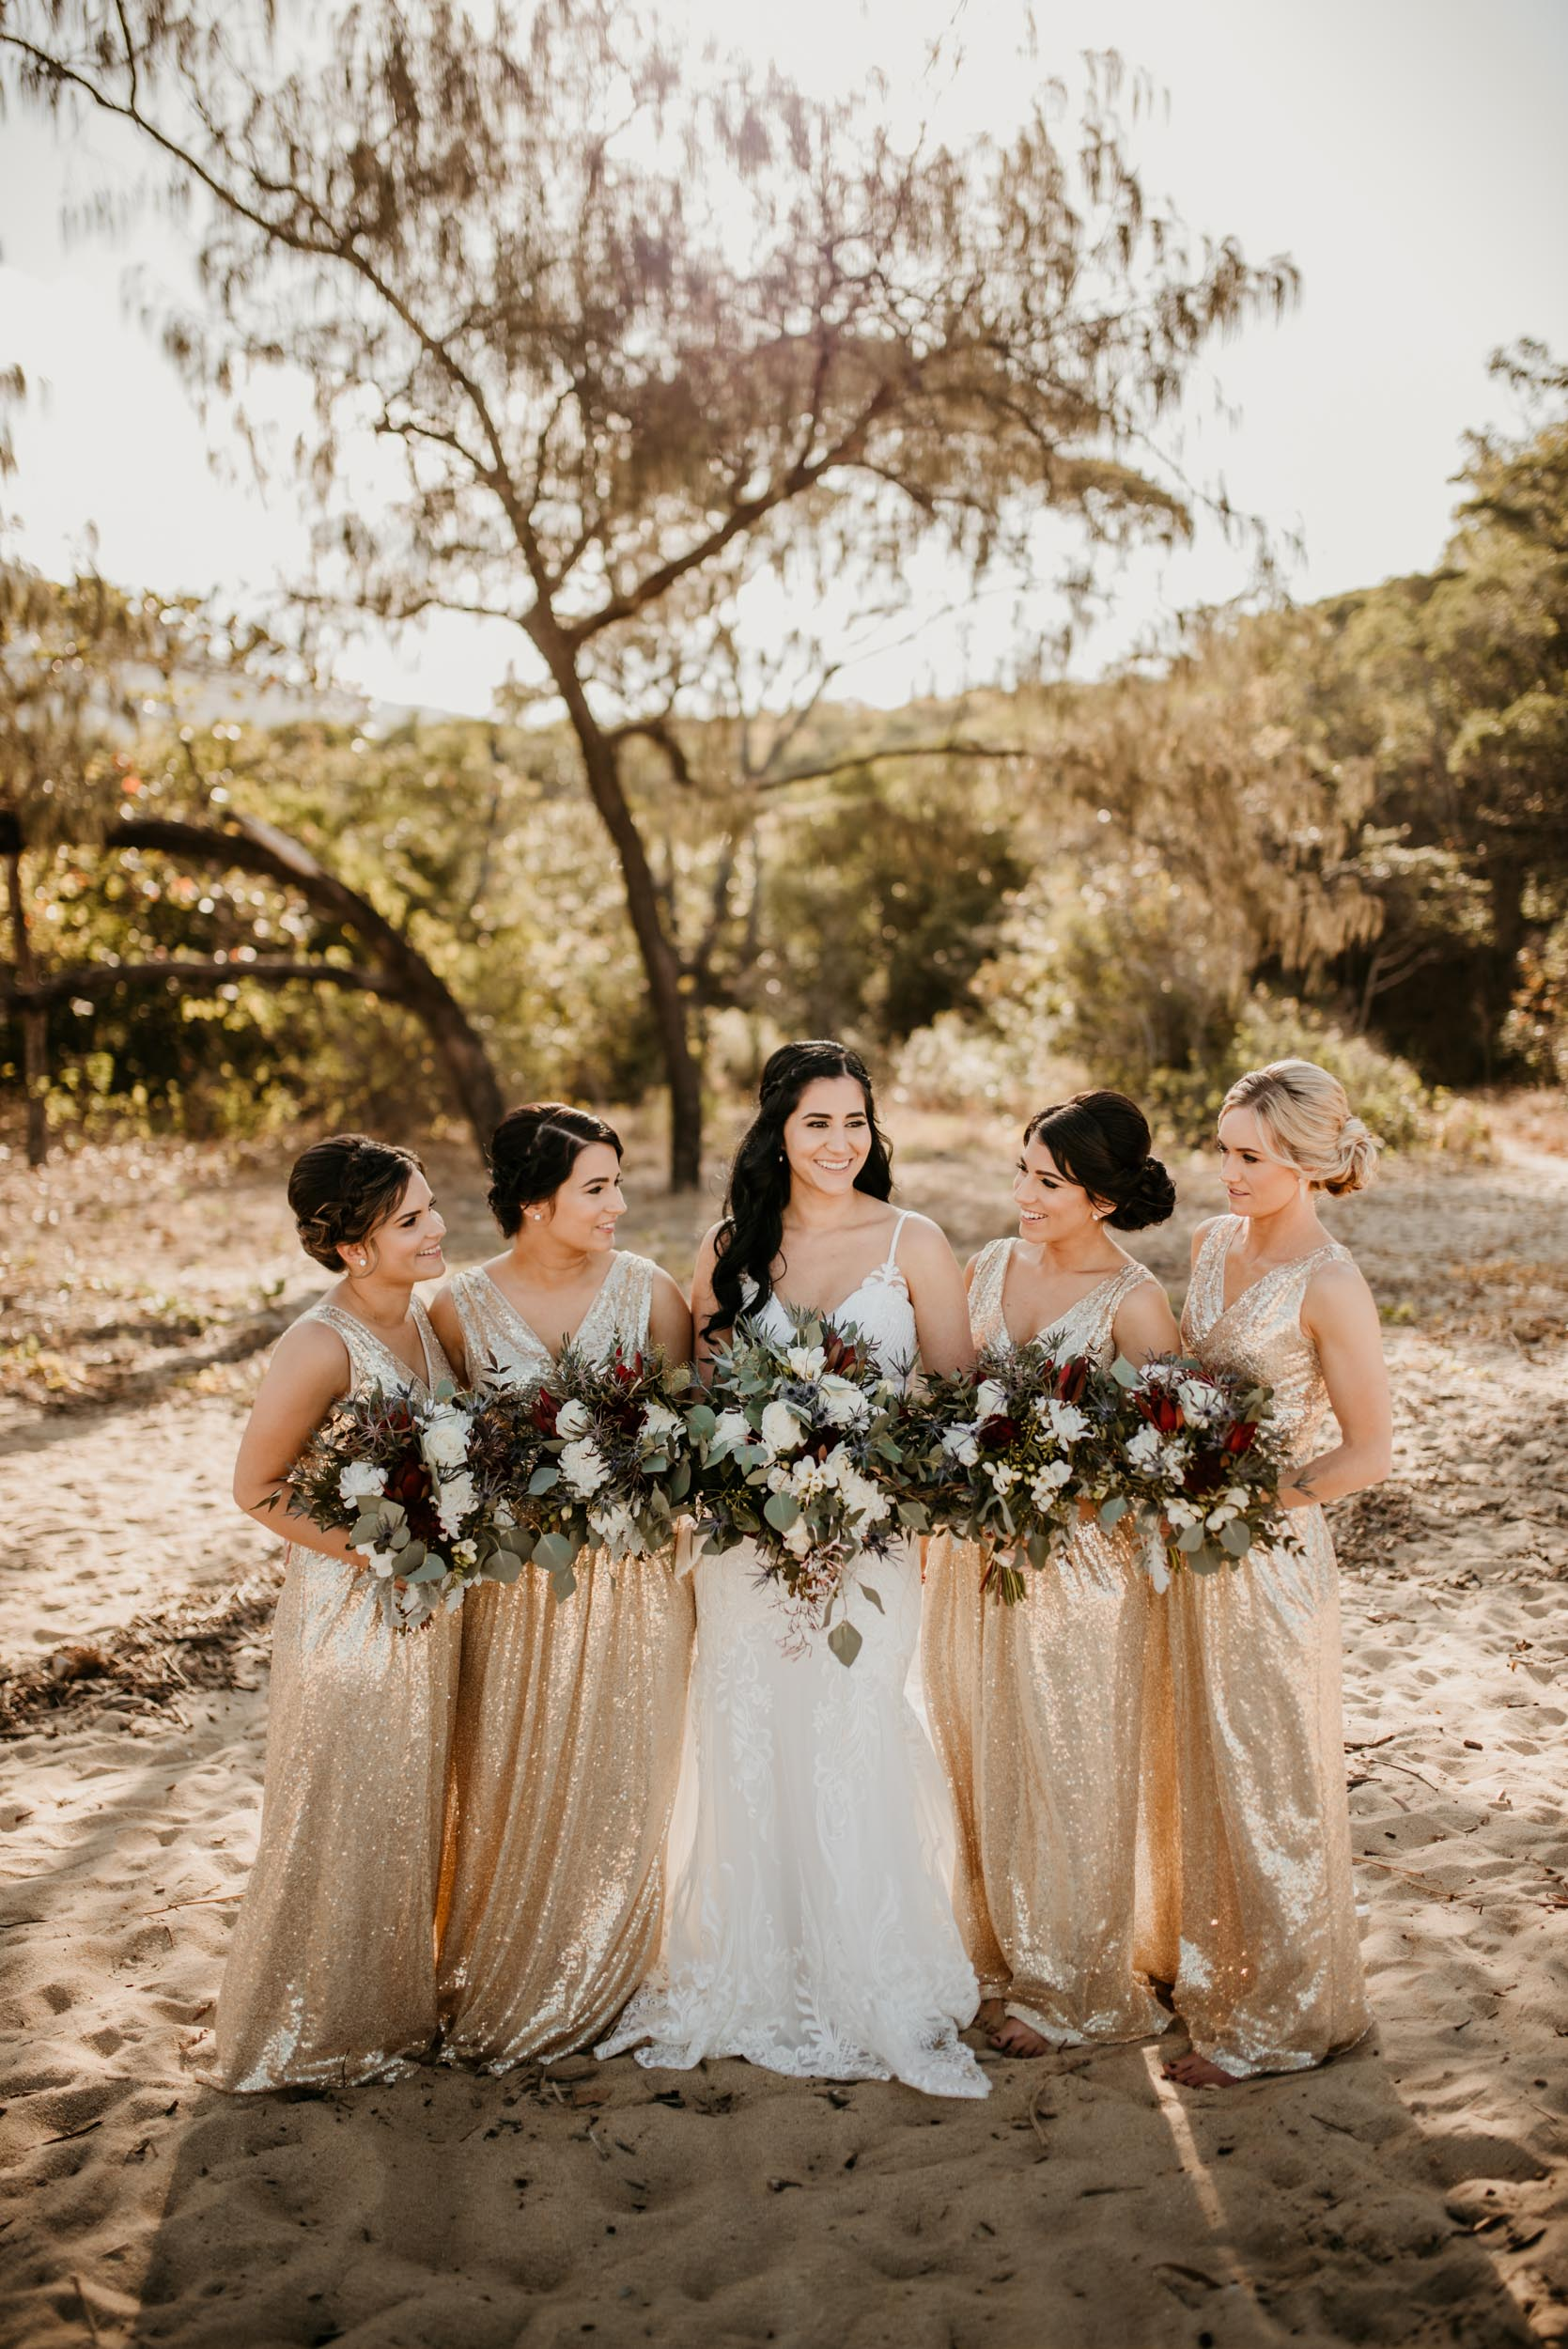 The Raw Photographer - Cairns and Port Douglas Wedding Photographer - Best of 2018-54.jpg